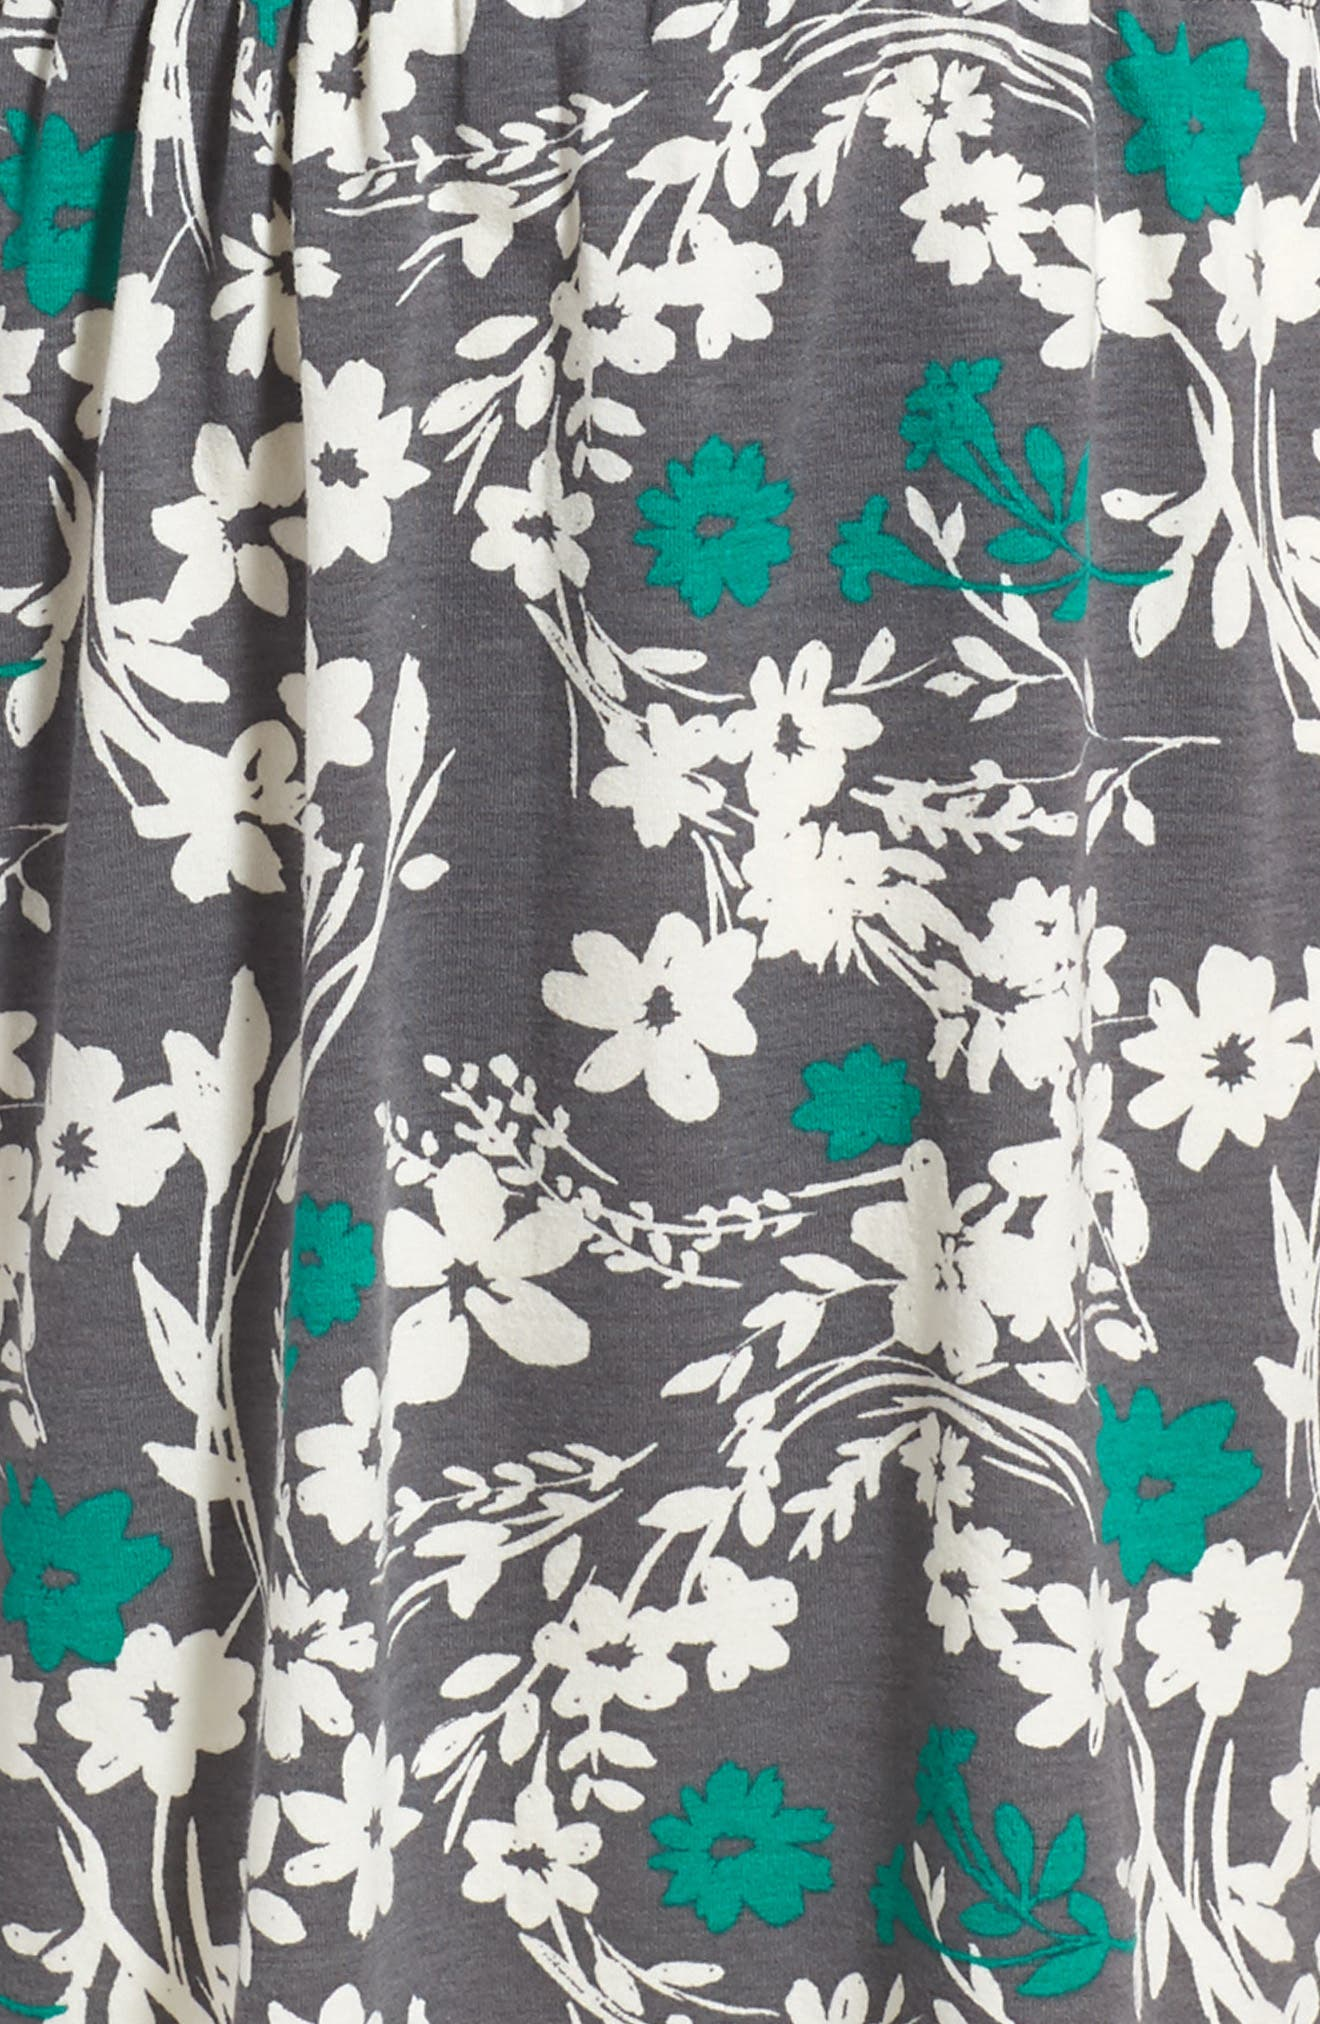 Cold Shoulder Print Dress,                             Alternate thumbnail 4, color,                             030